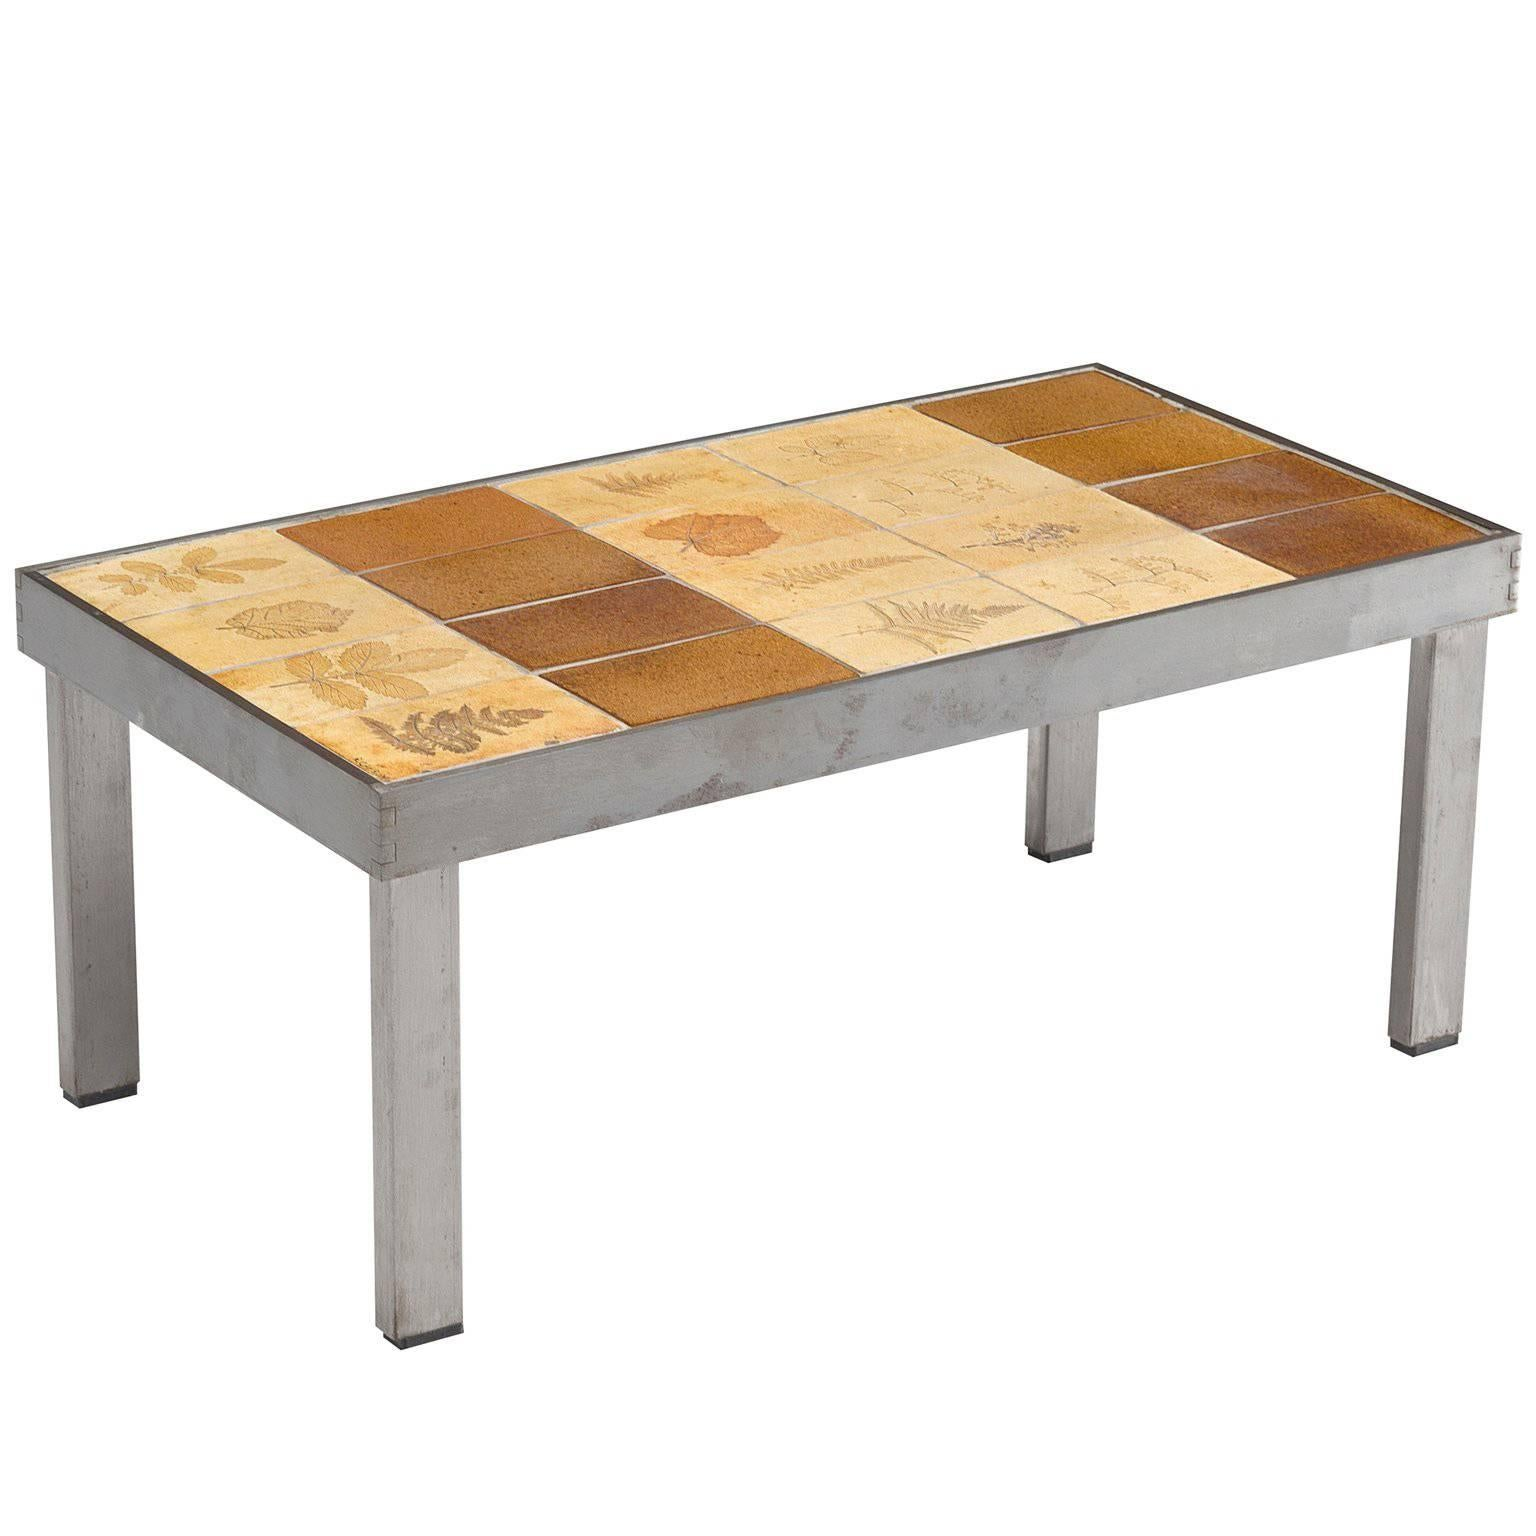 Roger Capron U0027Gariggueu0027 Ceramic Coffee Table